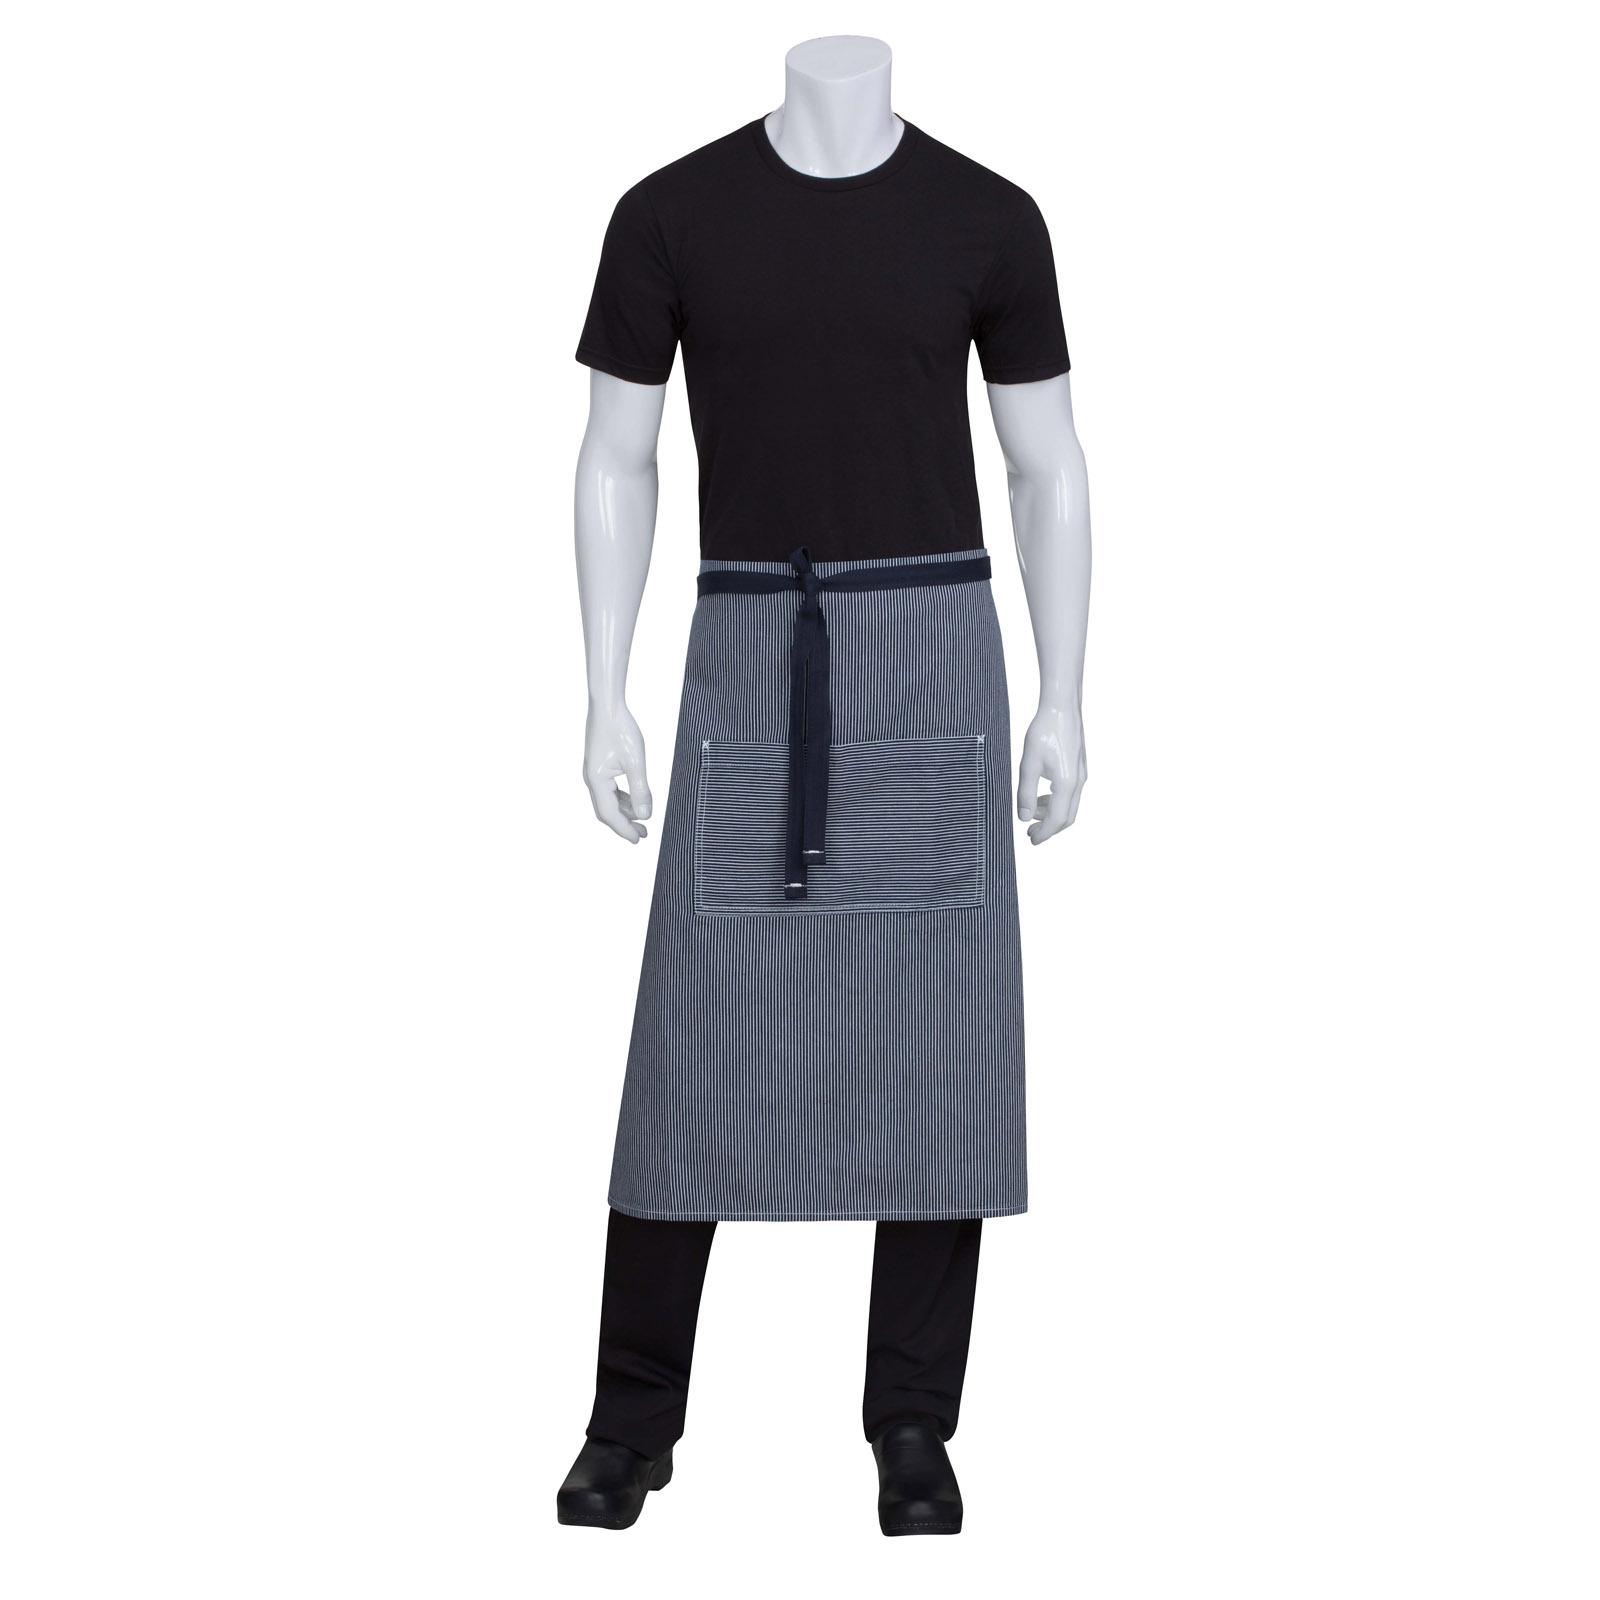 Chef Works AW051IBL0 waist apron